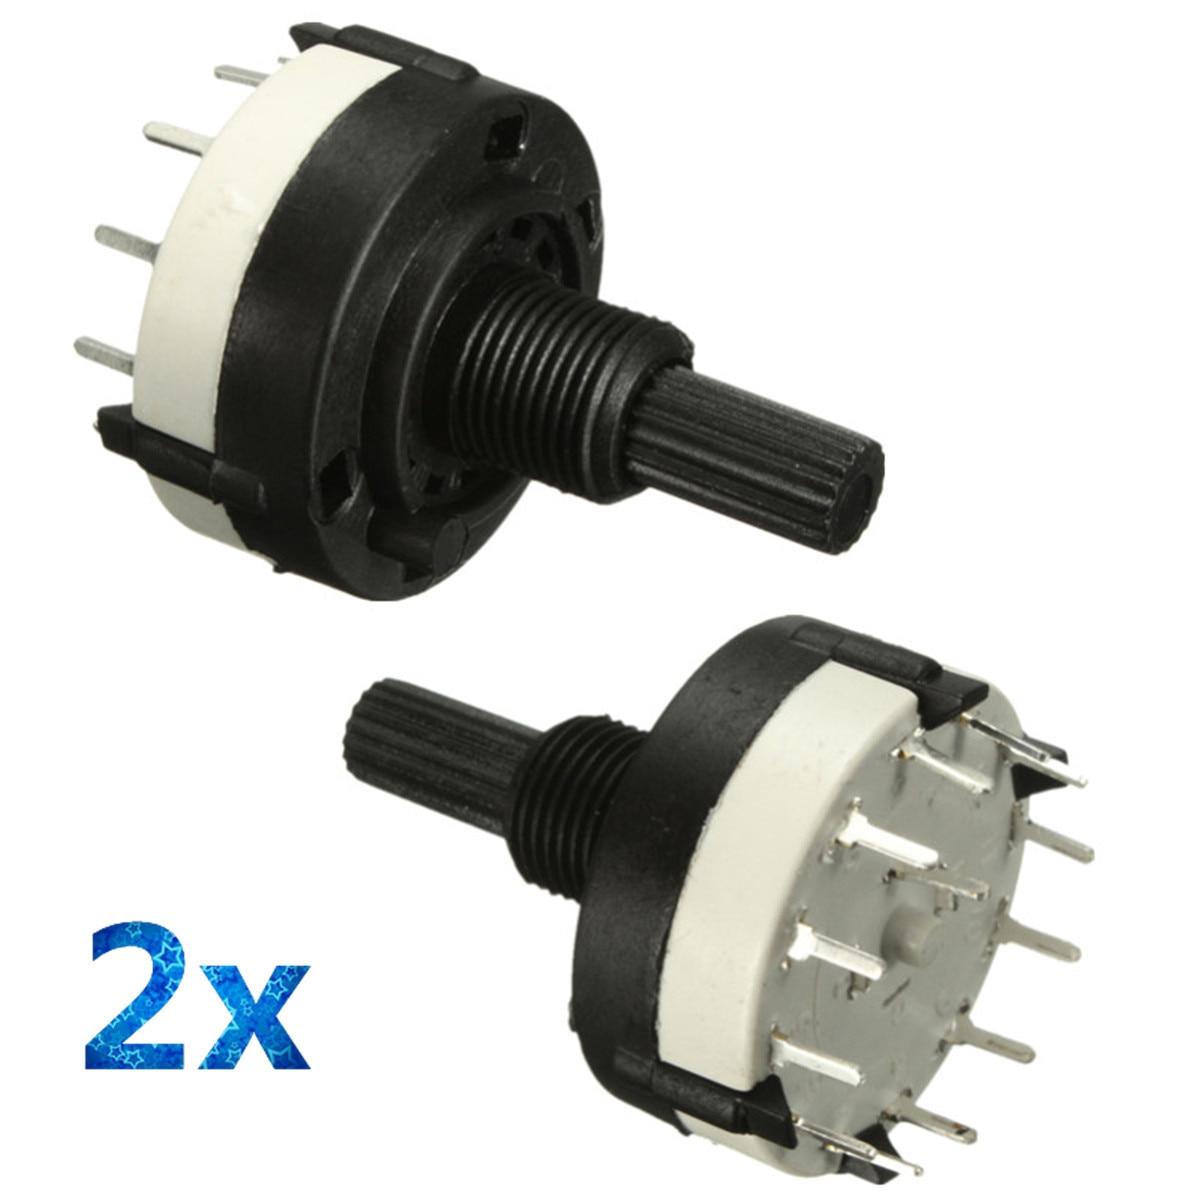 2pcs 1 Pole 12 Way 0.3A 250VAC Black Rotary Switch Solder Terminals 18 Teeth Shaft